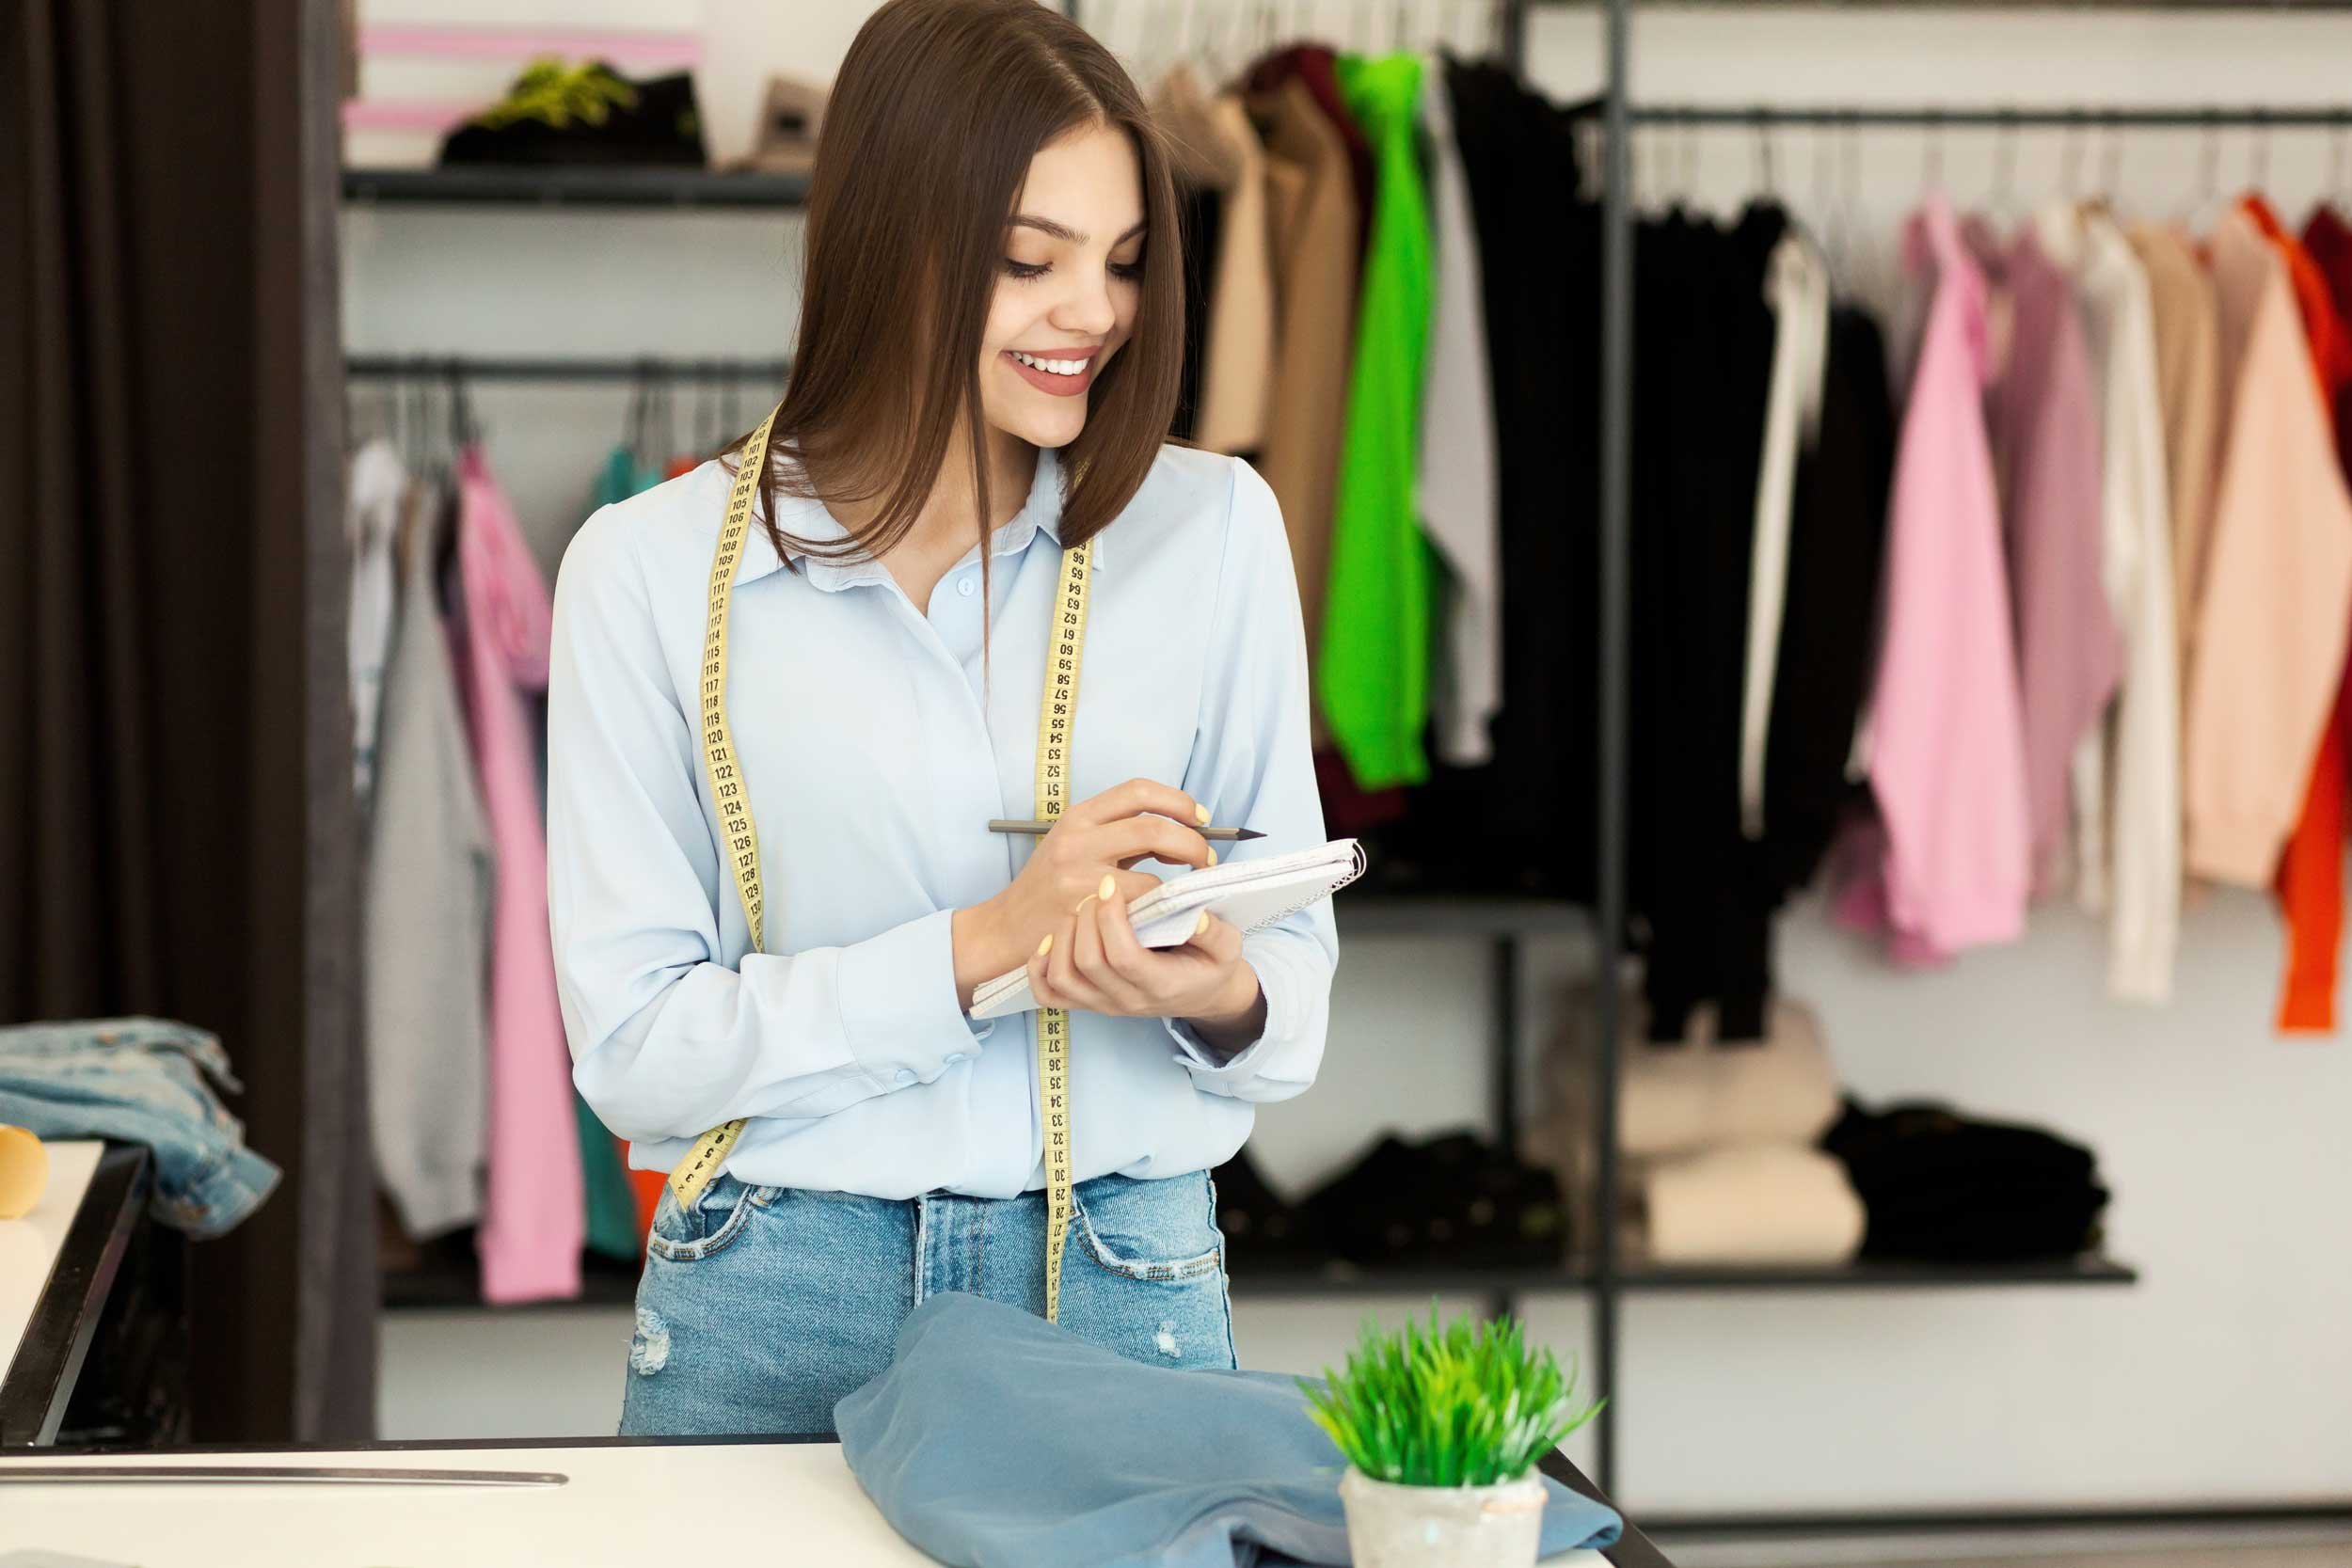 Grow your apparel business